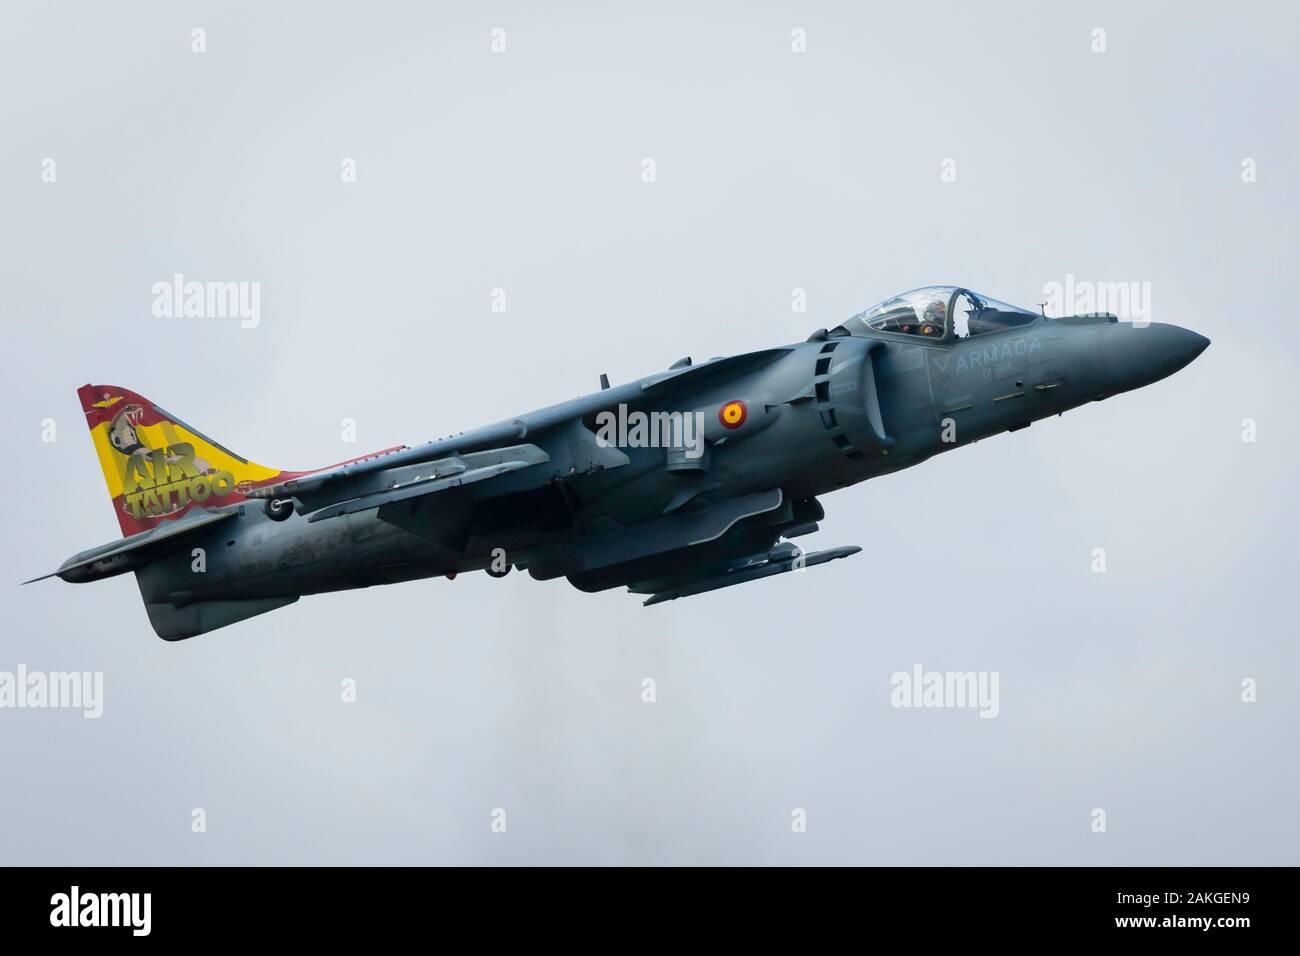 Fairford, Gloucestershire, UK - July 20th, 2019: Spanish Navy EAV-8B Harrier II Displays at the Fairford International Air Tattoo 2019 Stock Photo